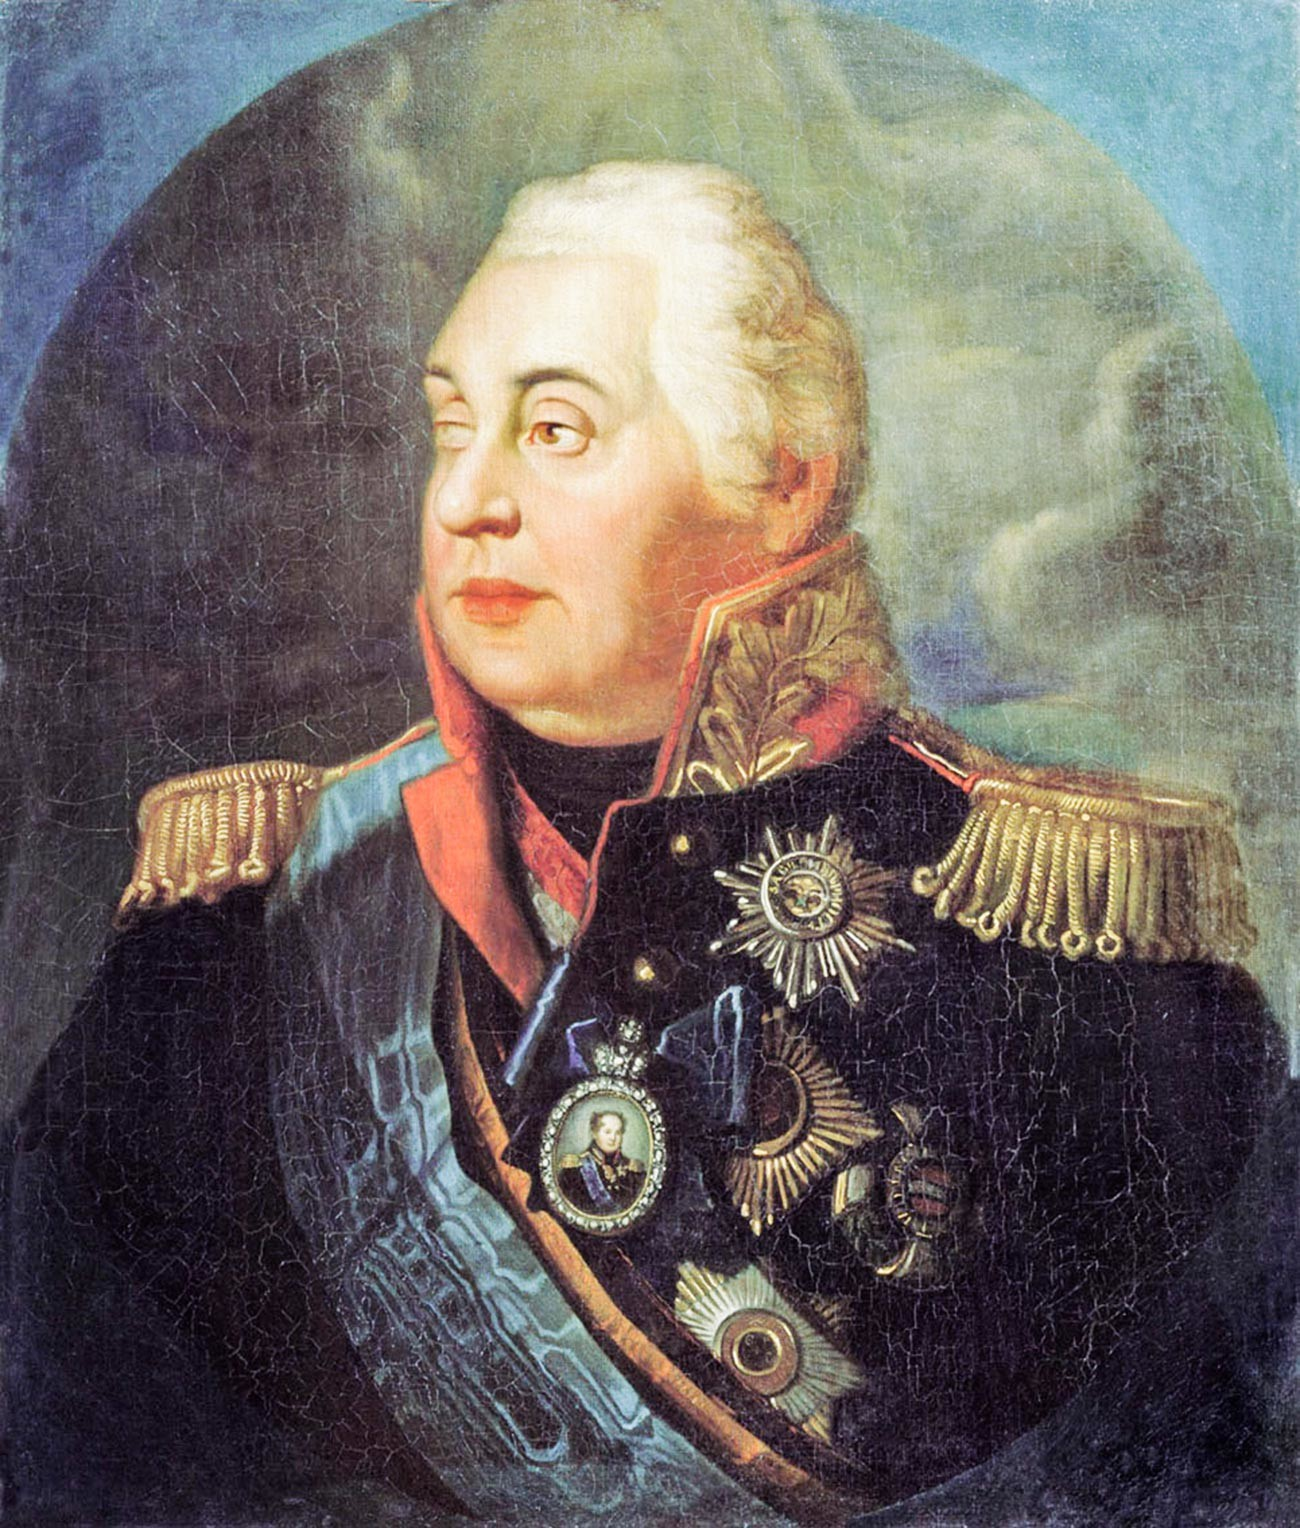 Portret ruskogo feldmaršala M.I. Kutuzova.